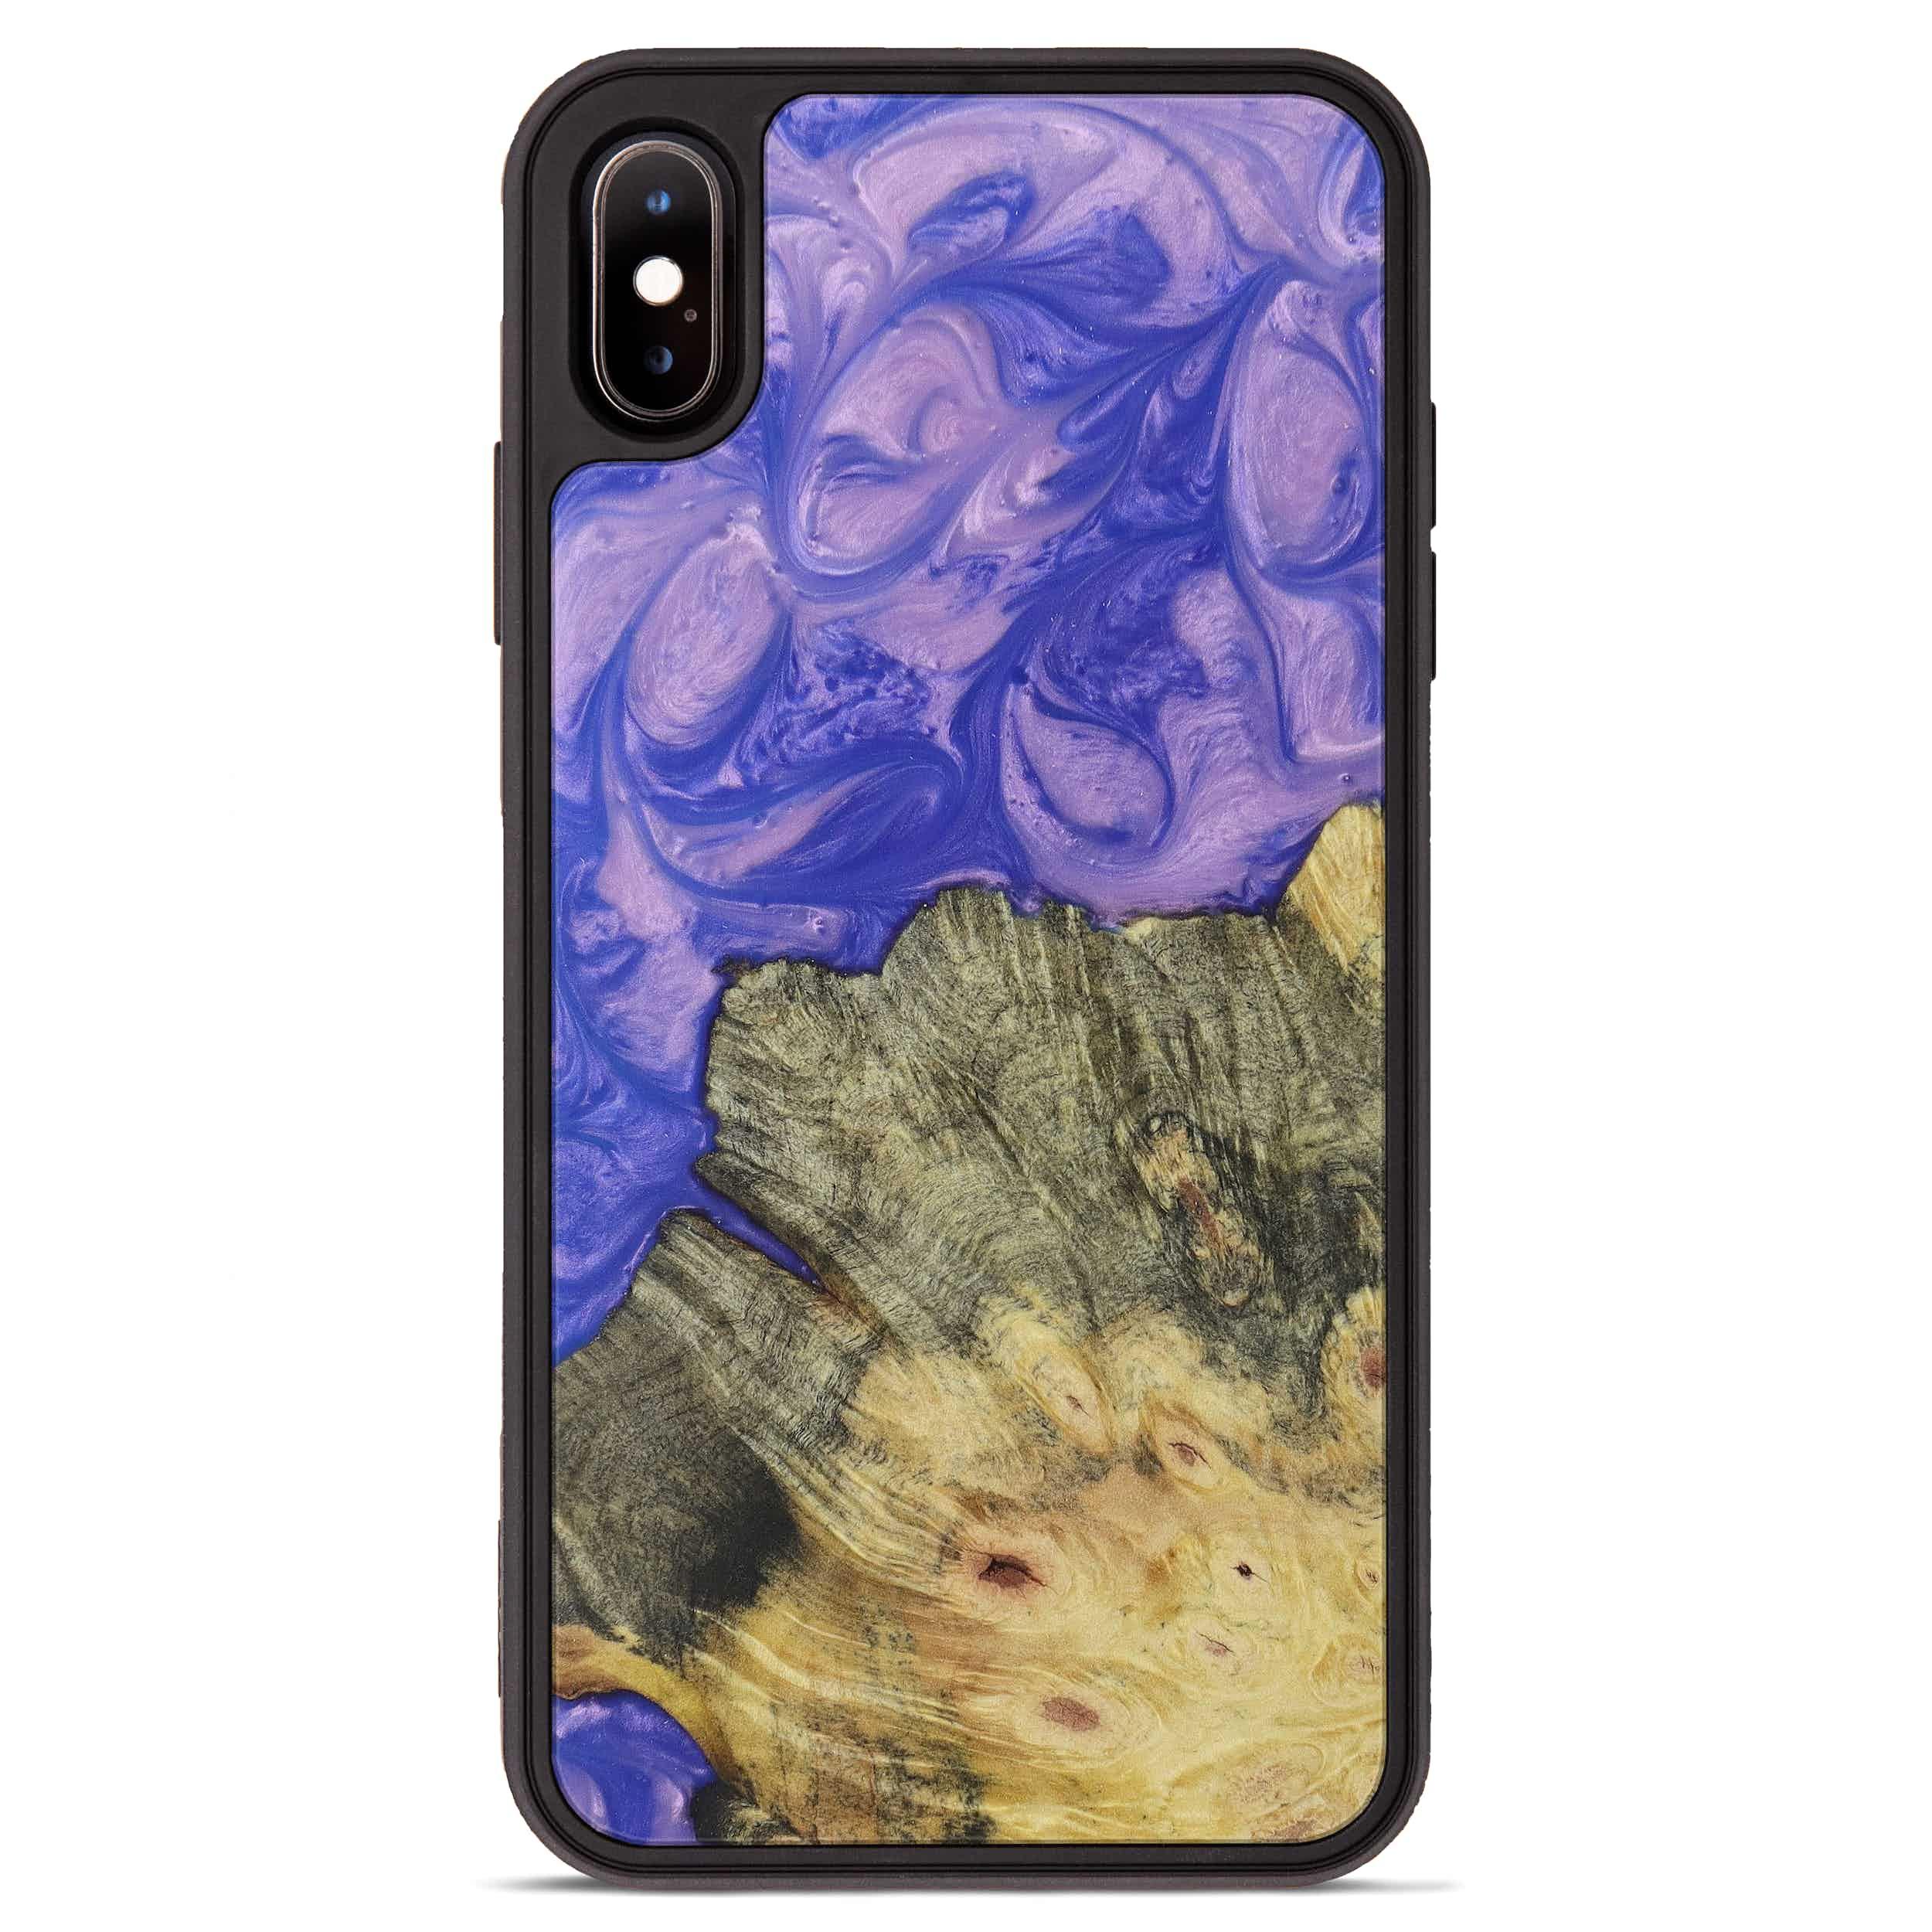 iPhone Xs Max Wood+Resin Phone Case - Peta (Purple, 395902)